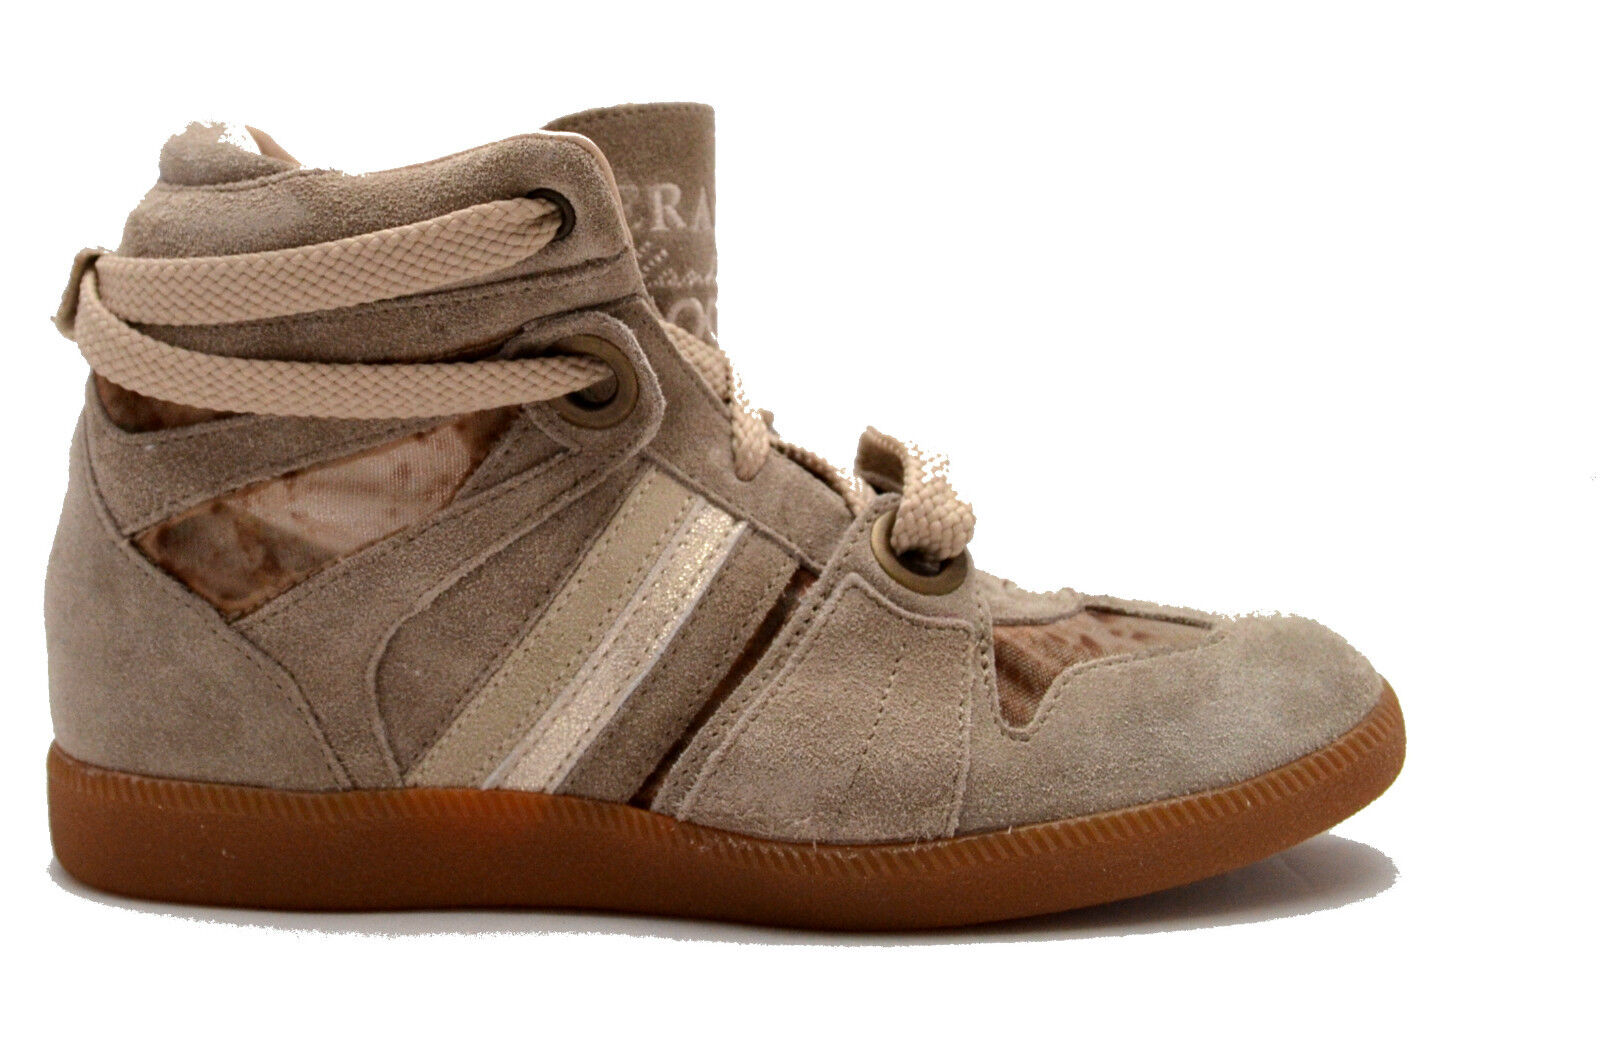 Serafini zapatos zapatillas alte pelle zapatos mujer beige Zeppa interna mujer 2752